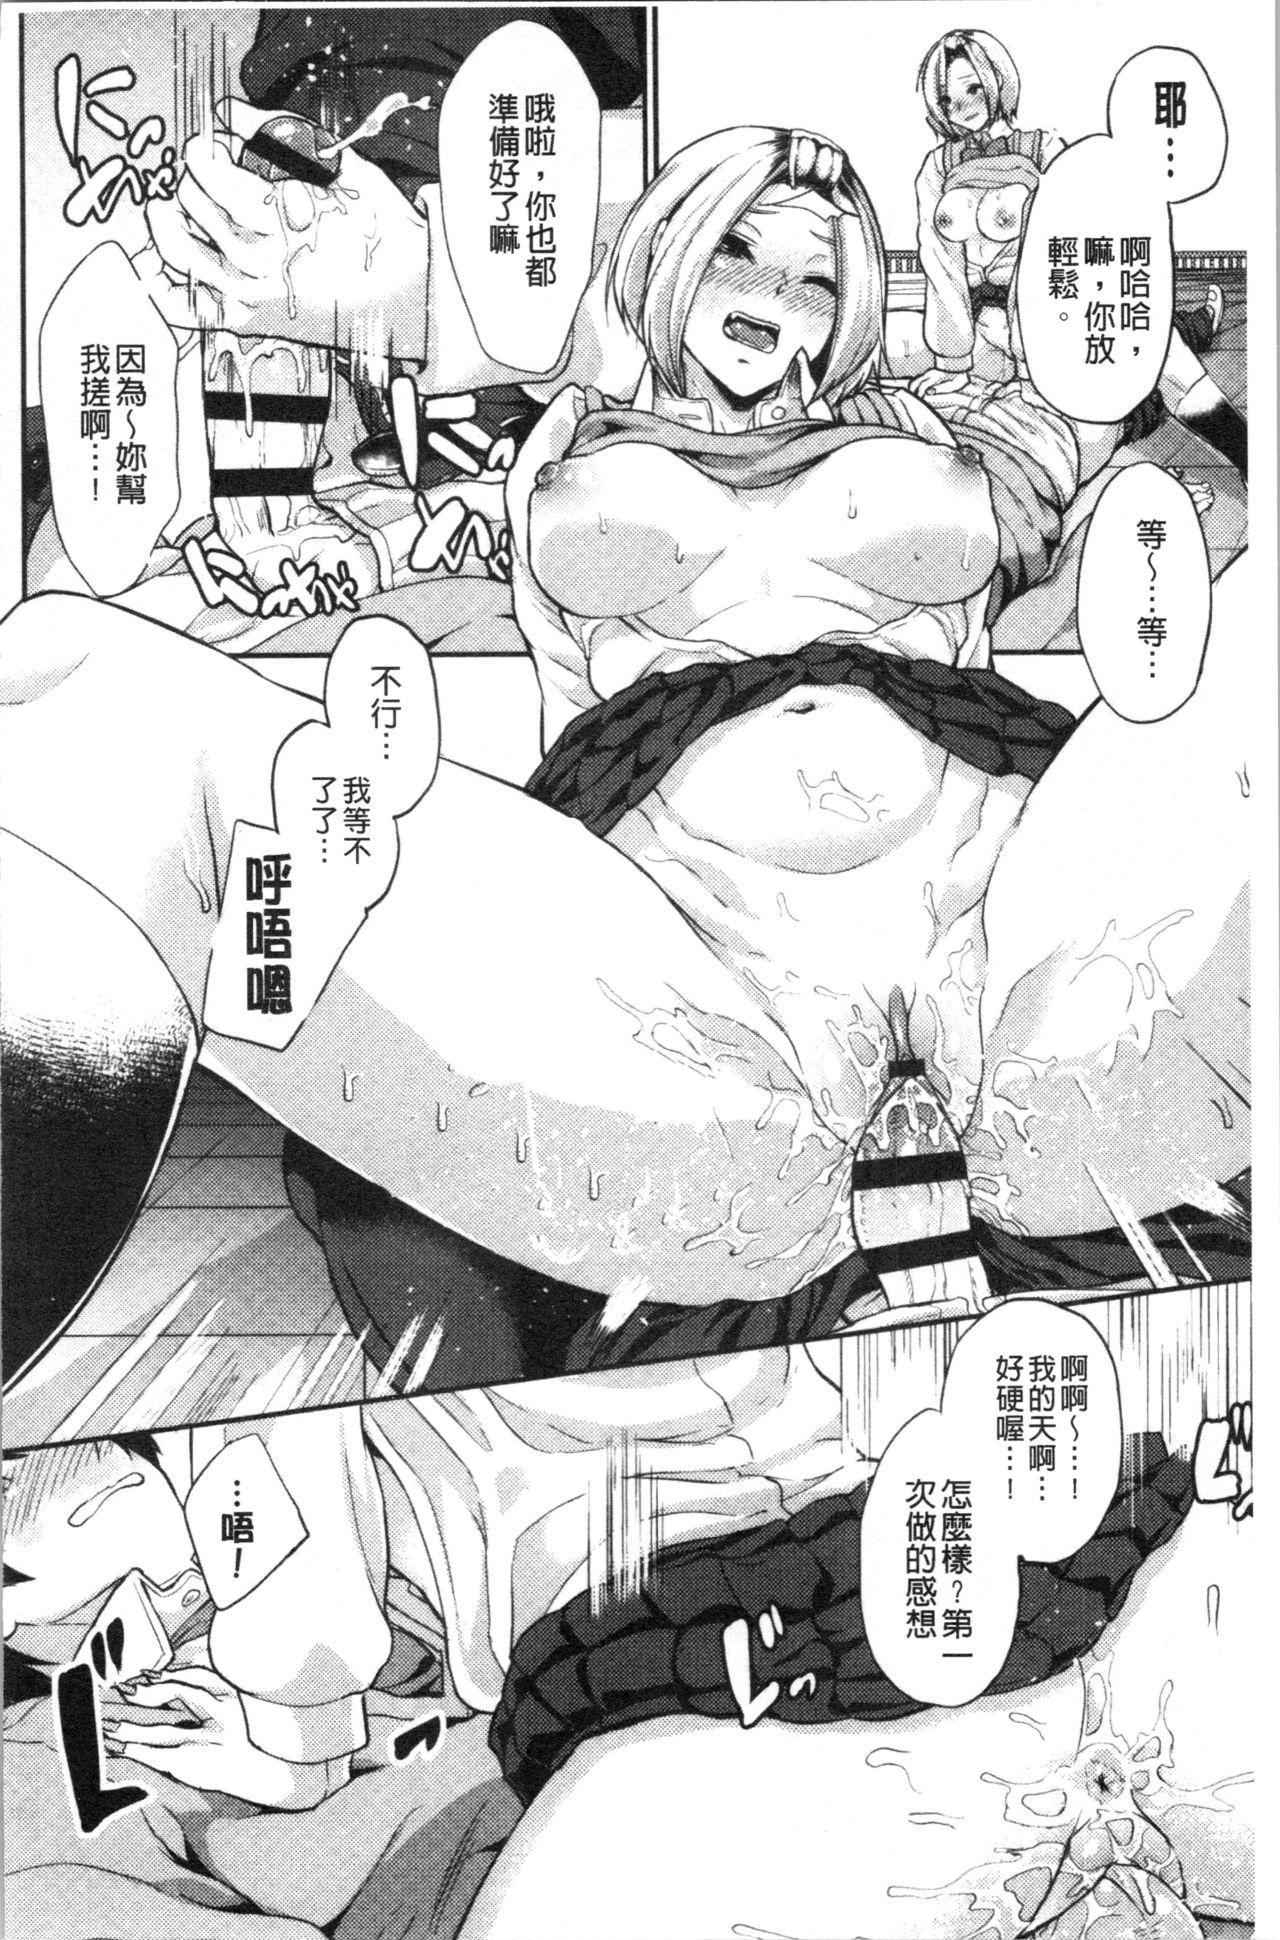 Kanojo ga SEX ni nare teru wake | 女友對激情性愛變很習慣的理由 98